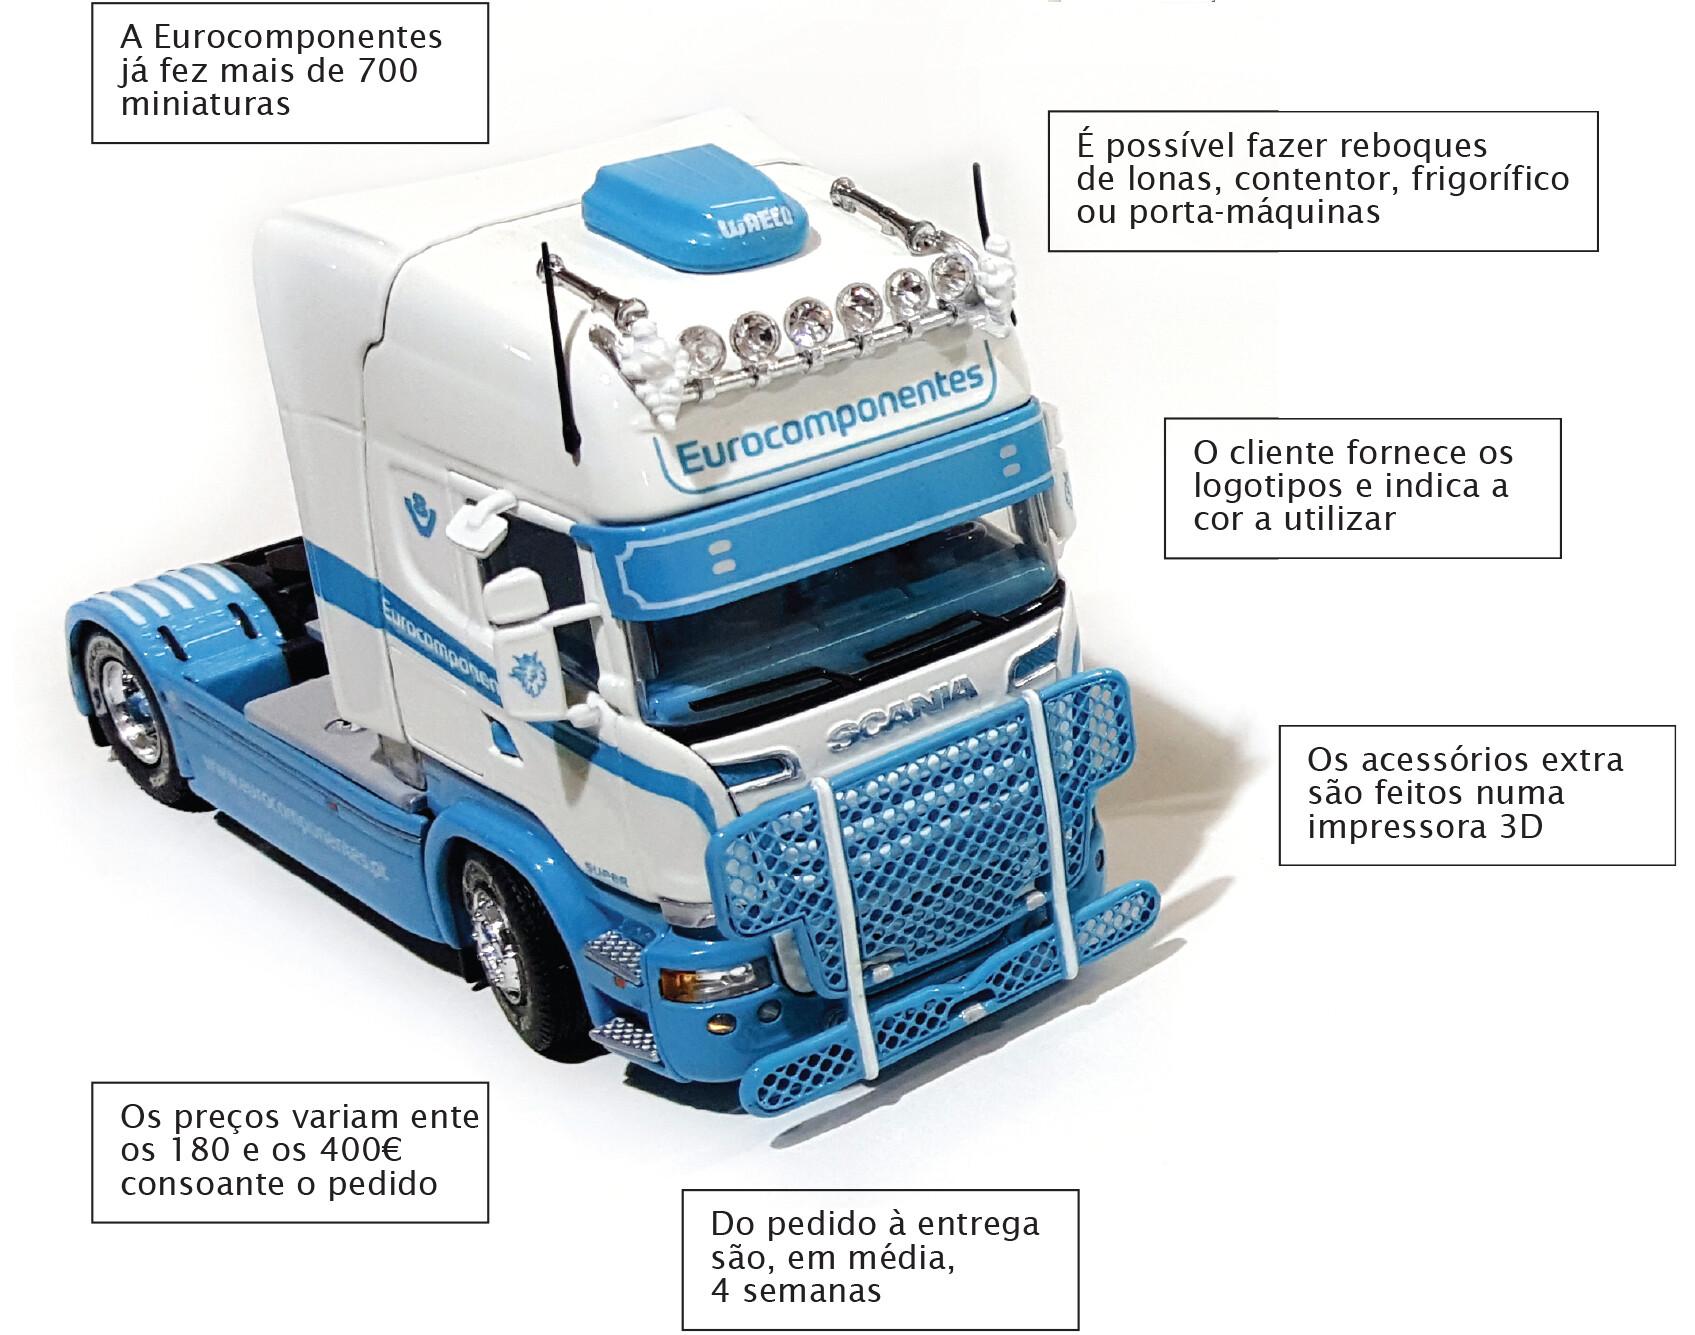 Eurocomponentes